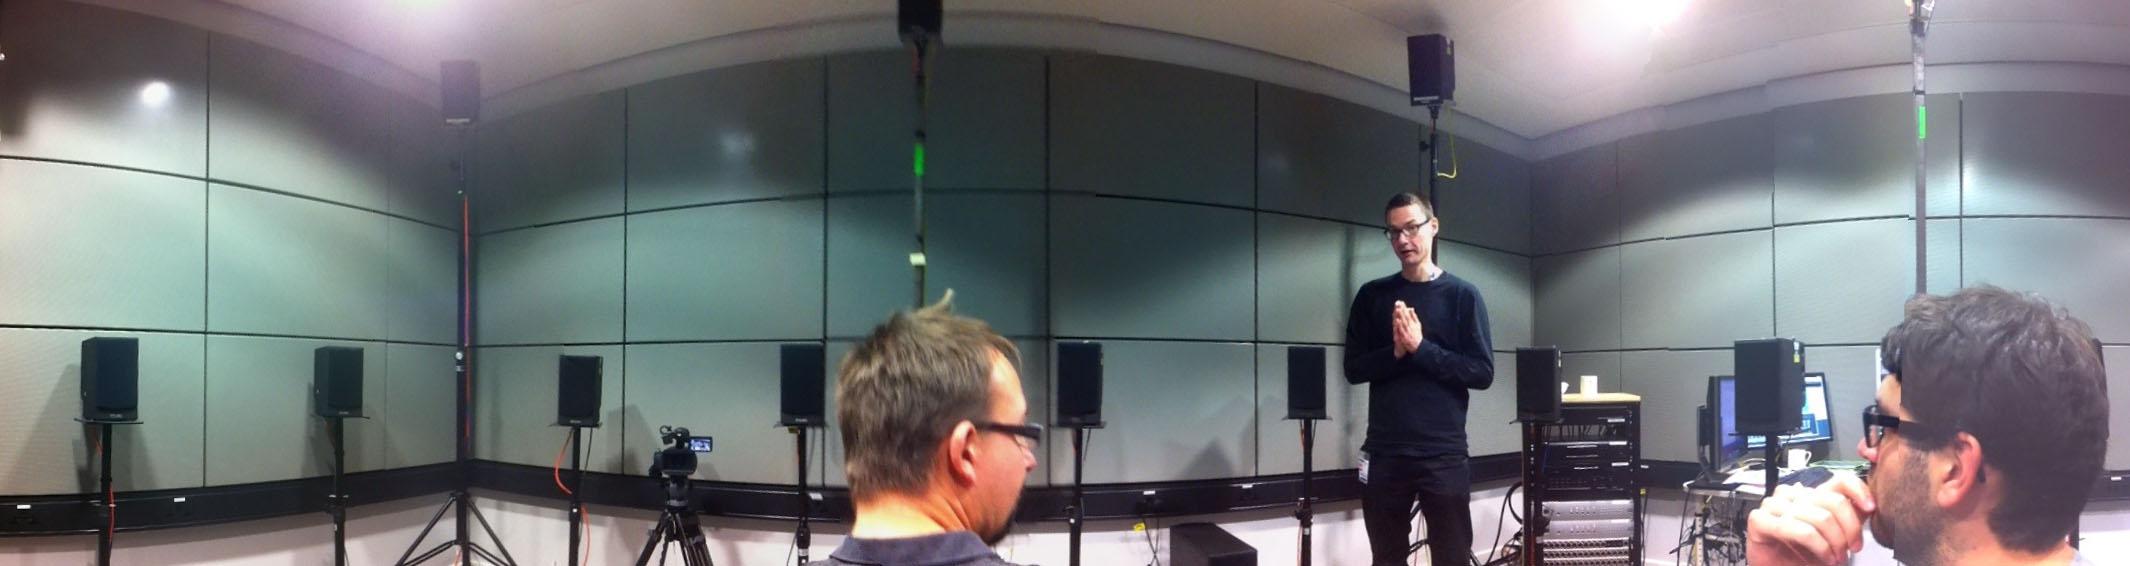 24.2. Abhöranlage im BBC R&D listening room